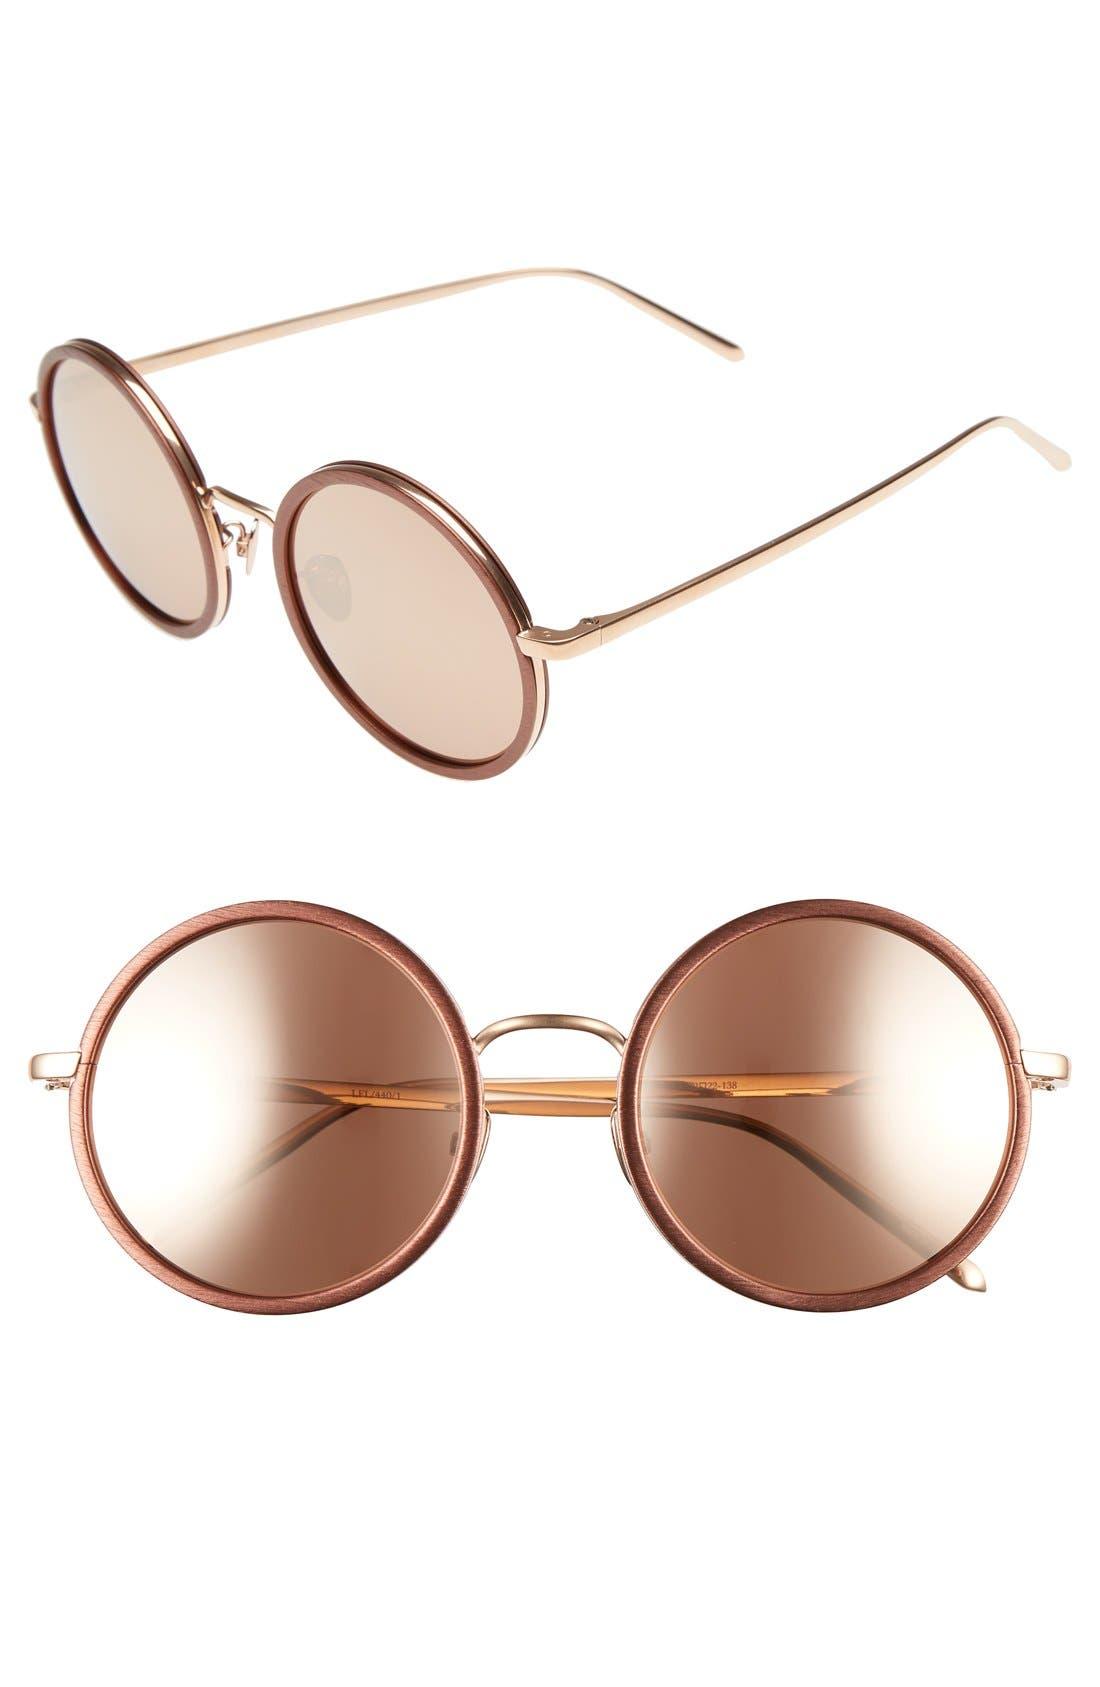 52mm Round 18 Karat Rose Gold Trim Sunglasses,                             Main thumbnail 1, color,                             221